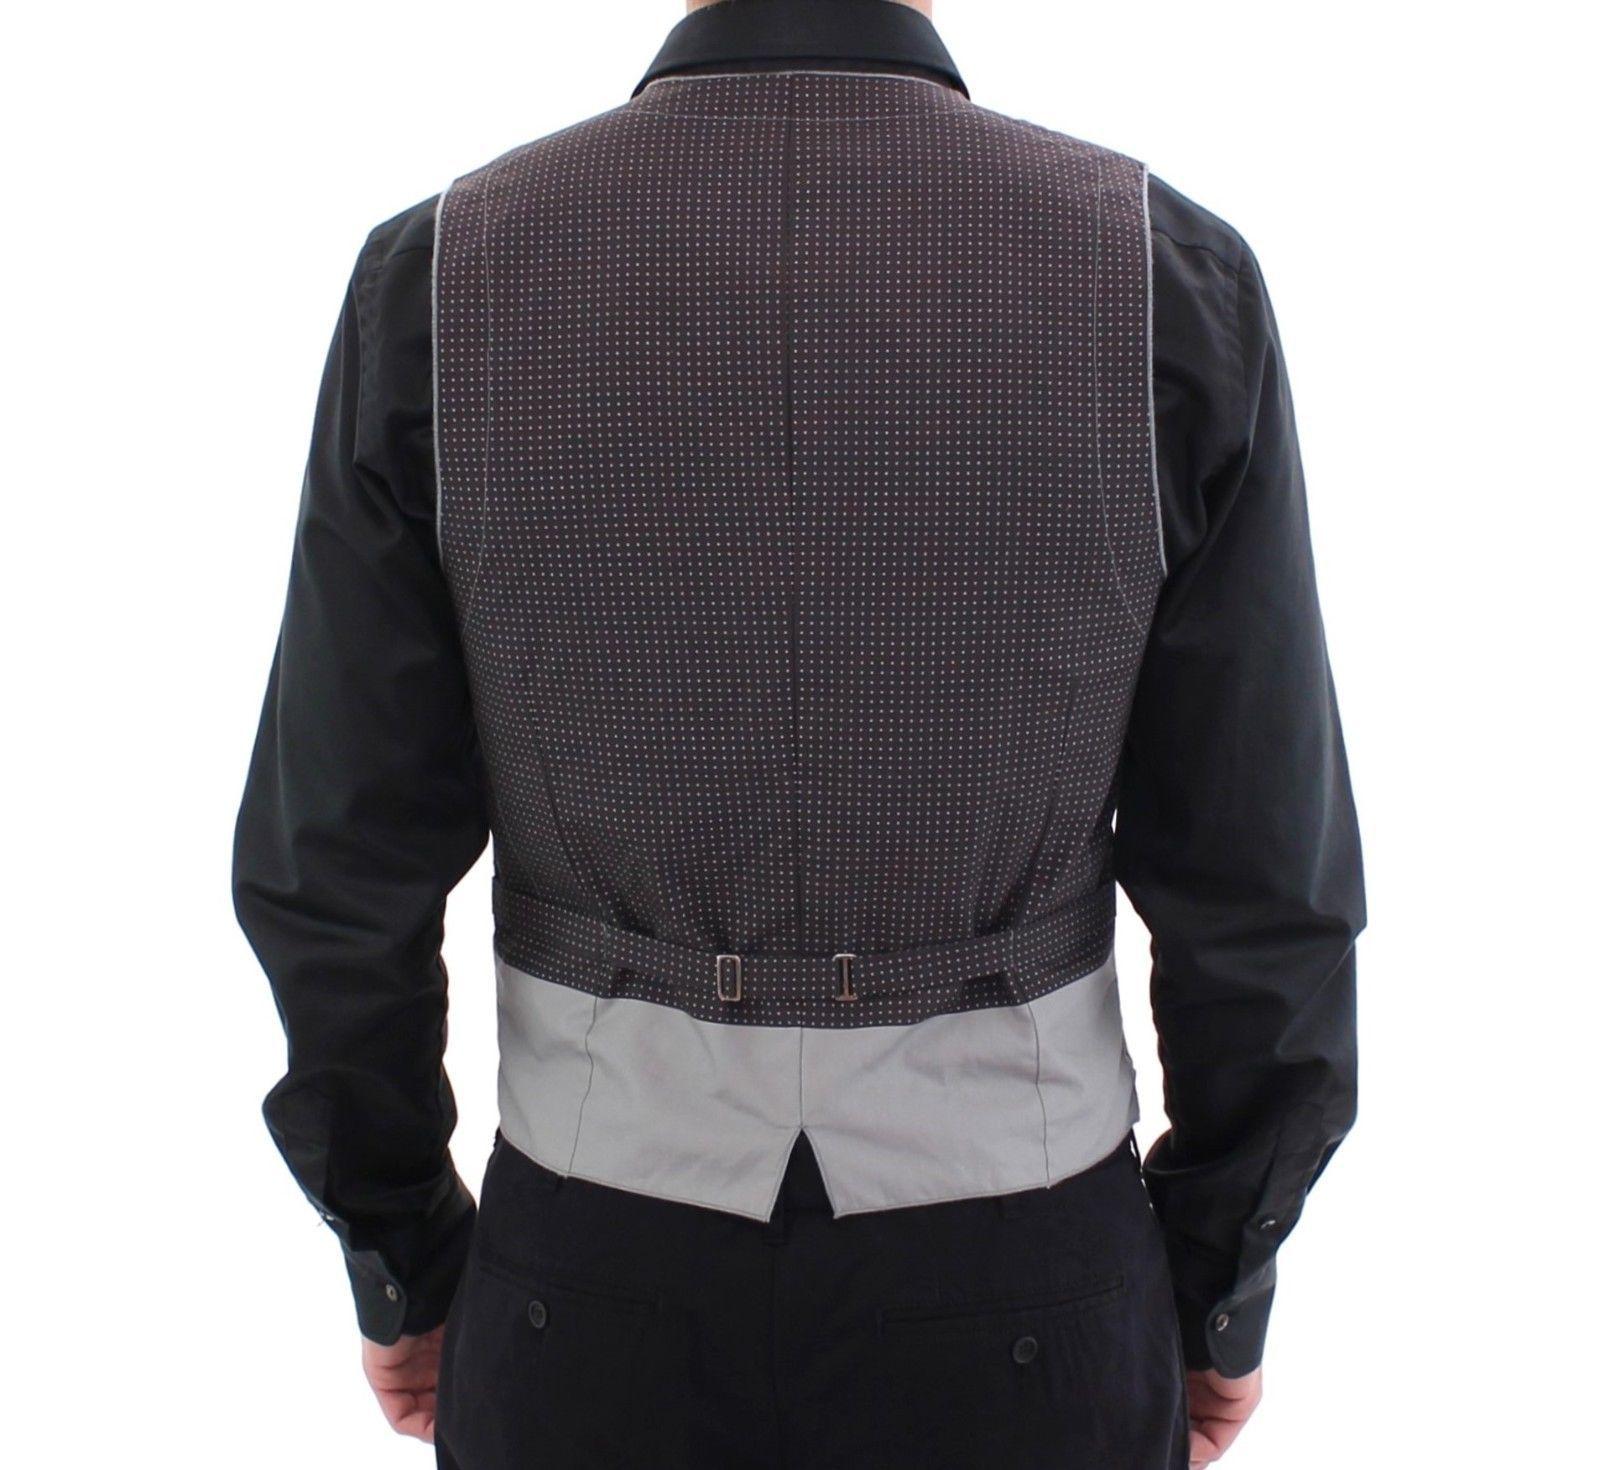 Dolce & Gabbana Gray Polka Dot Dress Vest Gilet Weste